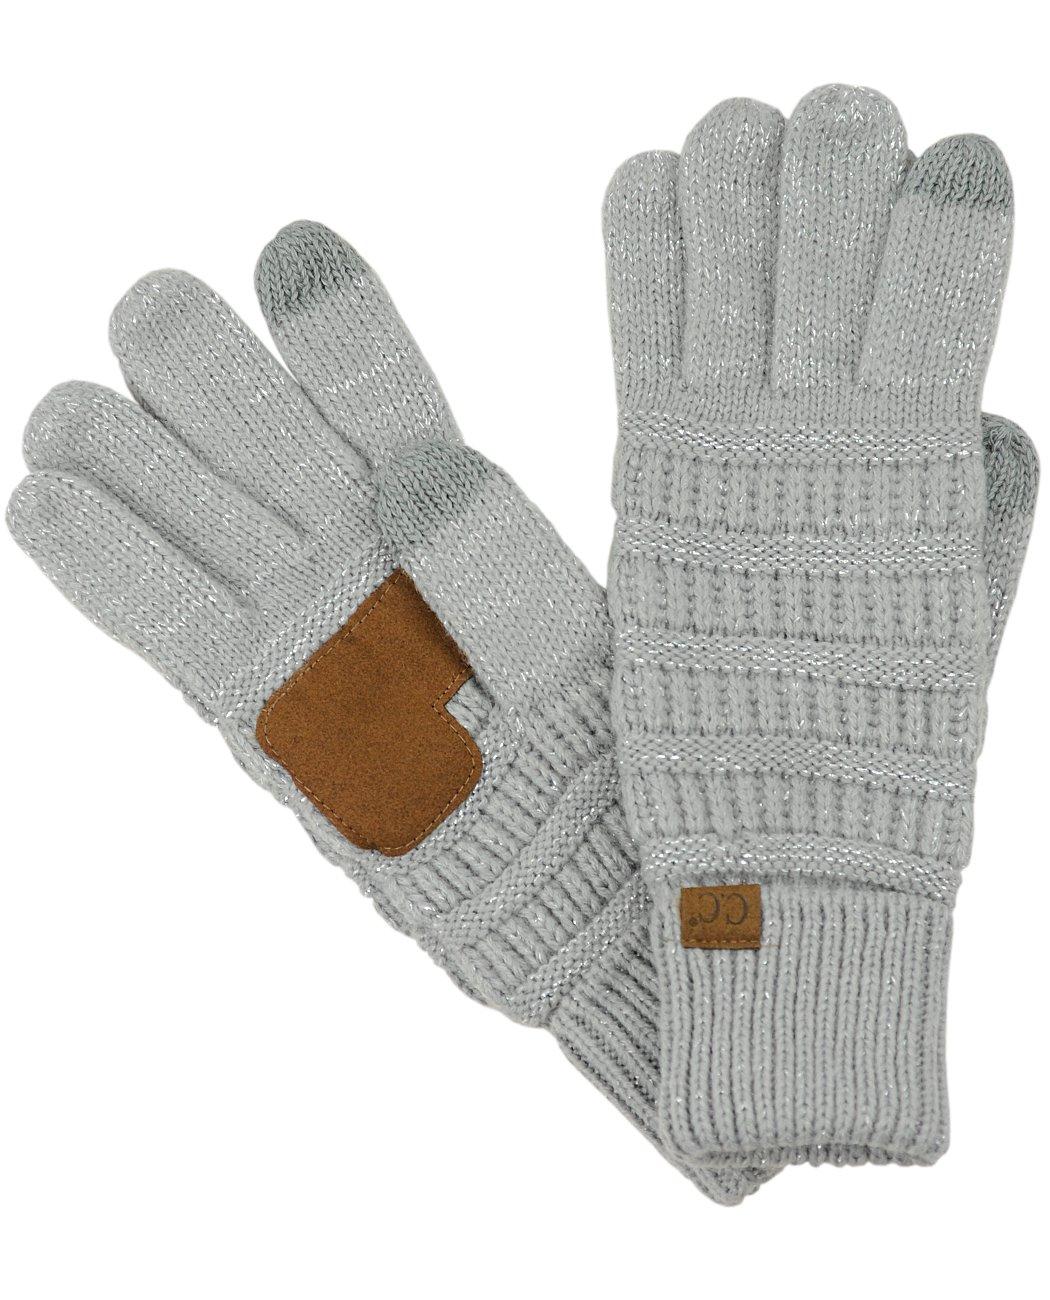 C.C Unisex Cable Knit Winter Warm Anti-Slip Touchscreen Texting Gloves, Light Melange Gray G20-LT MEL GY